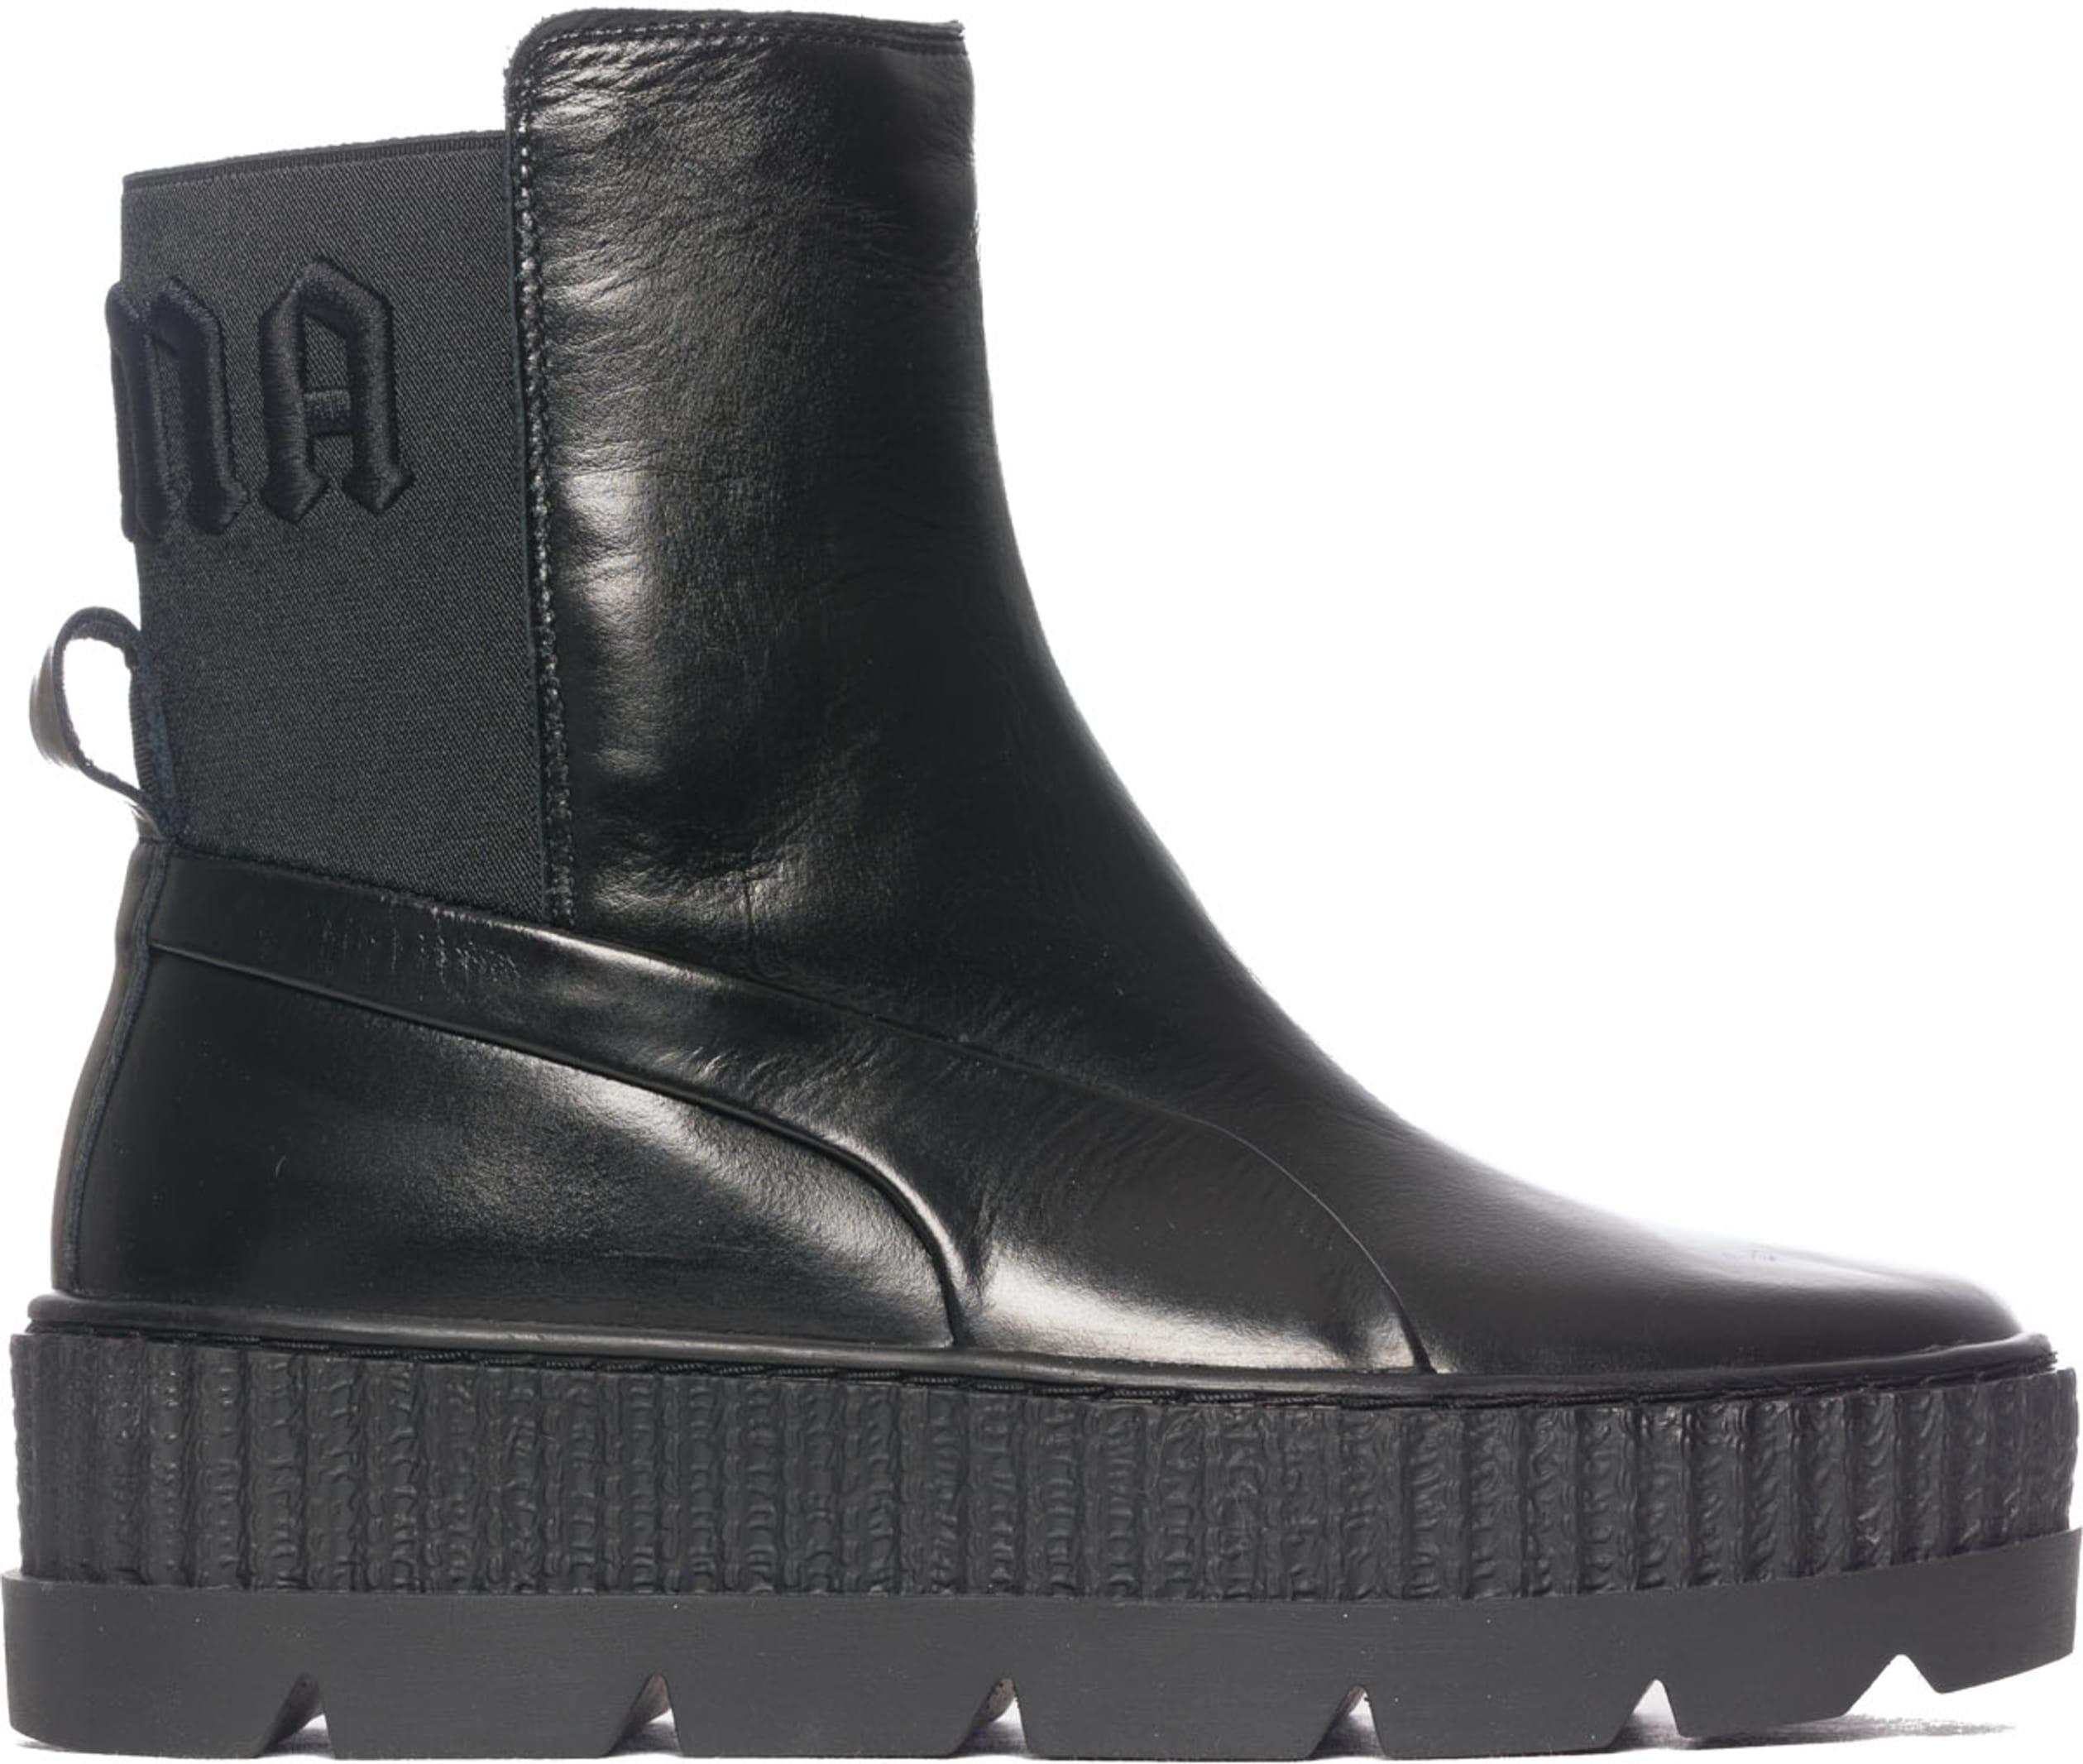 new arrival d0e1a e8e81 Puma - Fenty Chelsea Sneaker Boots - Puma Black